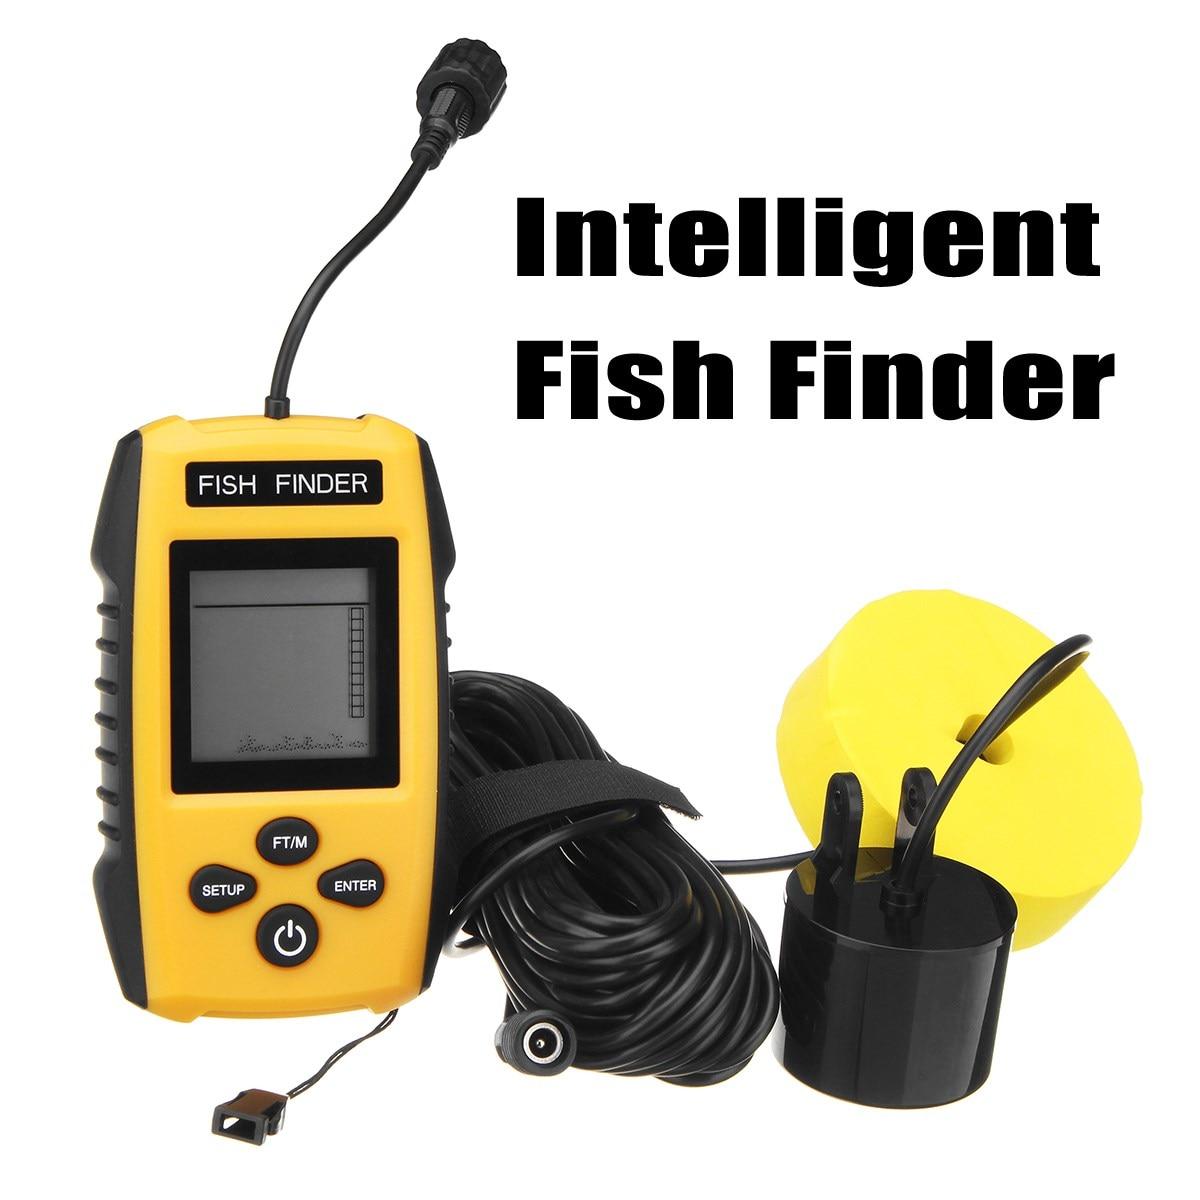 FF1108-1 Portable Sonar Alarm Fish Finder Sounder 200KHz LCD Blue Color Screen 0.6-100M Transducer Sensor Depth Finder Water lucky ff718lic portable 200khz 83khz dual frequency fish finder waterproof depth echo sounder wired transducer color lcd c3